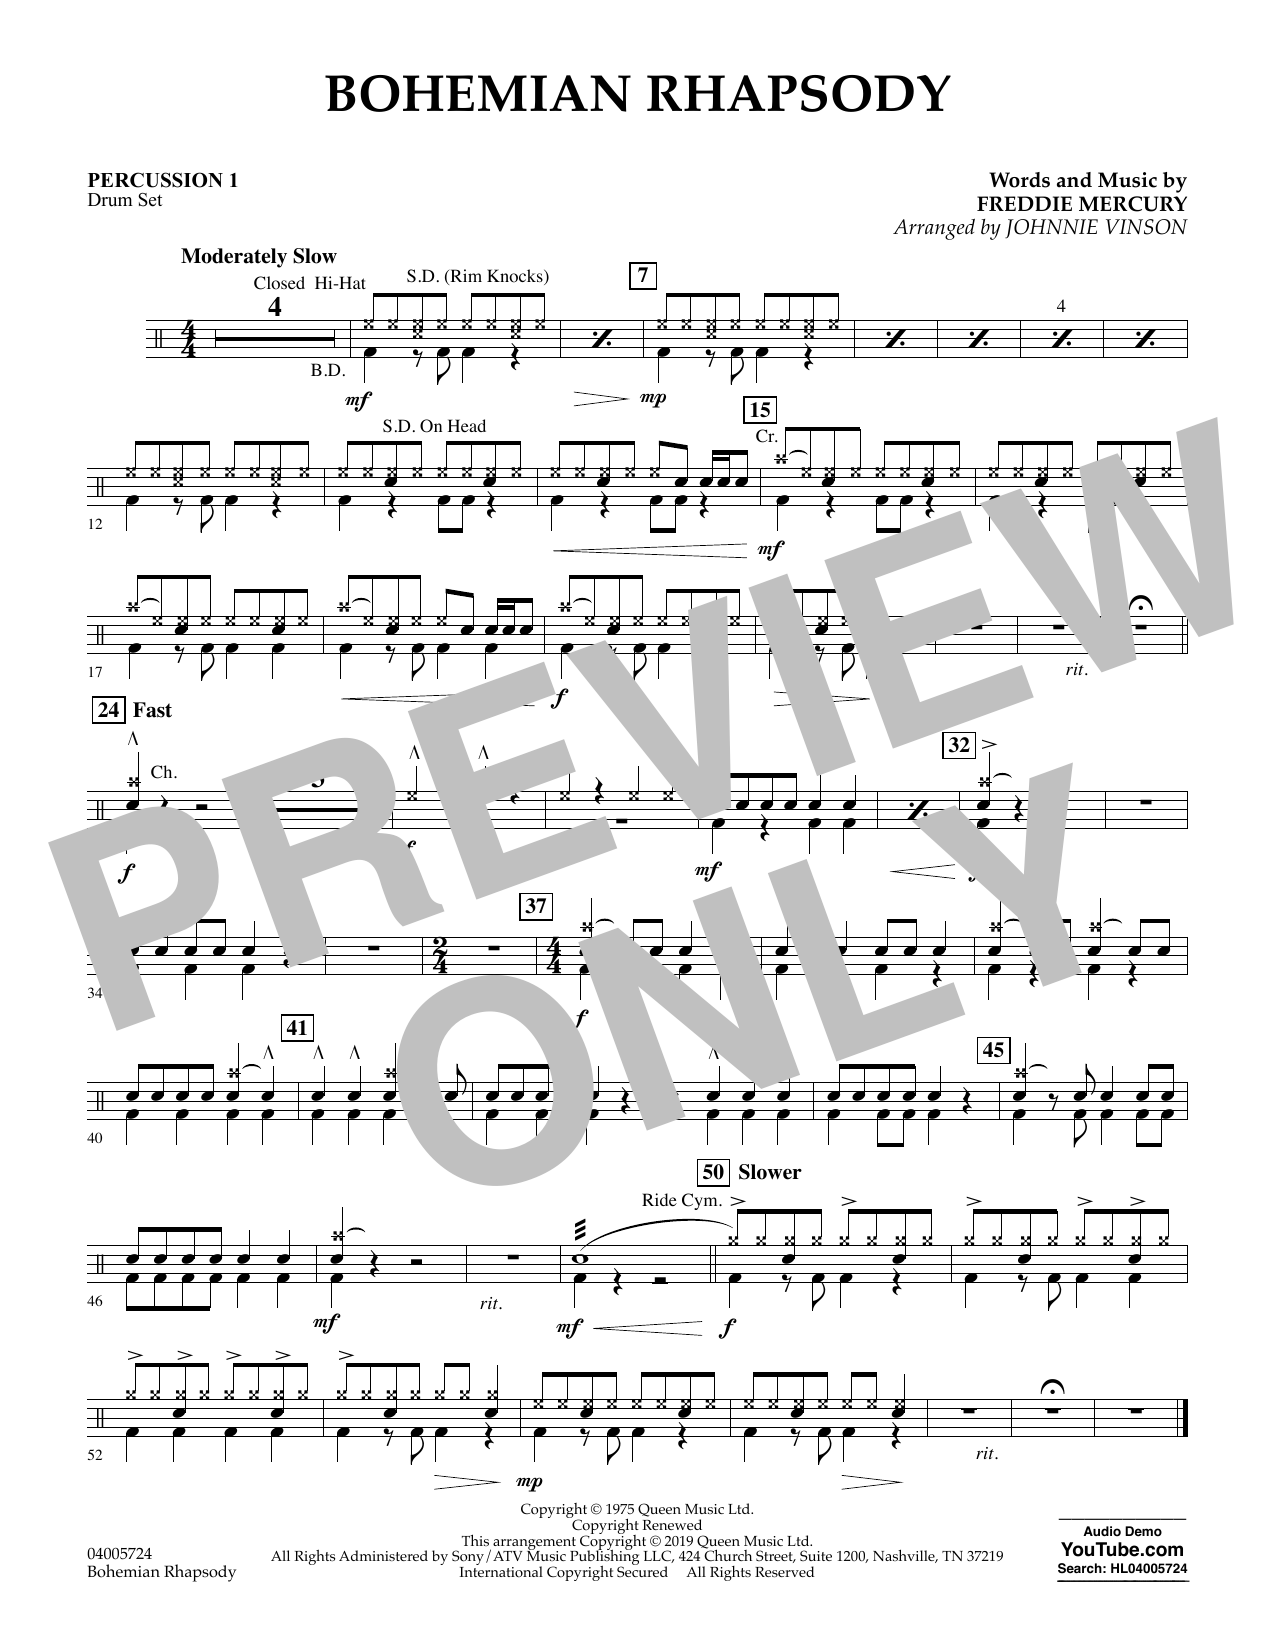 Bohemian Rhapsody (arr. Johnnie Vinson) - Percussion 1 (Concert Band)